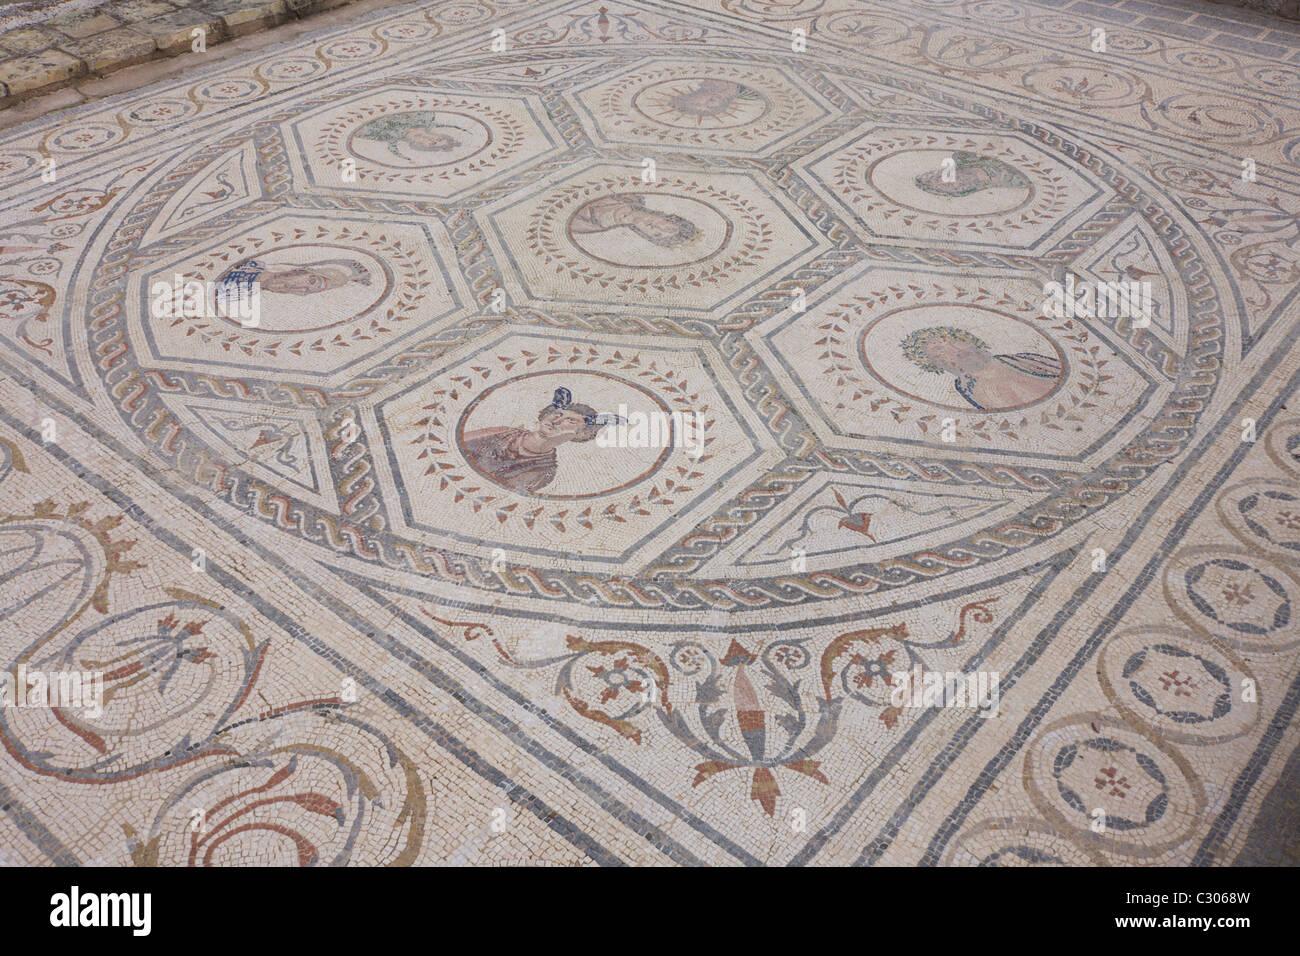 mosaic-representations-of-roman-celestia